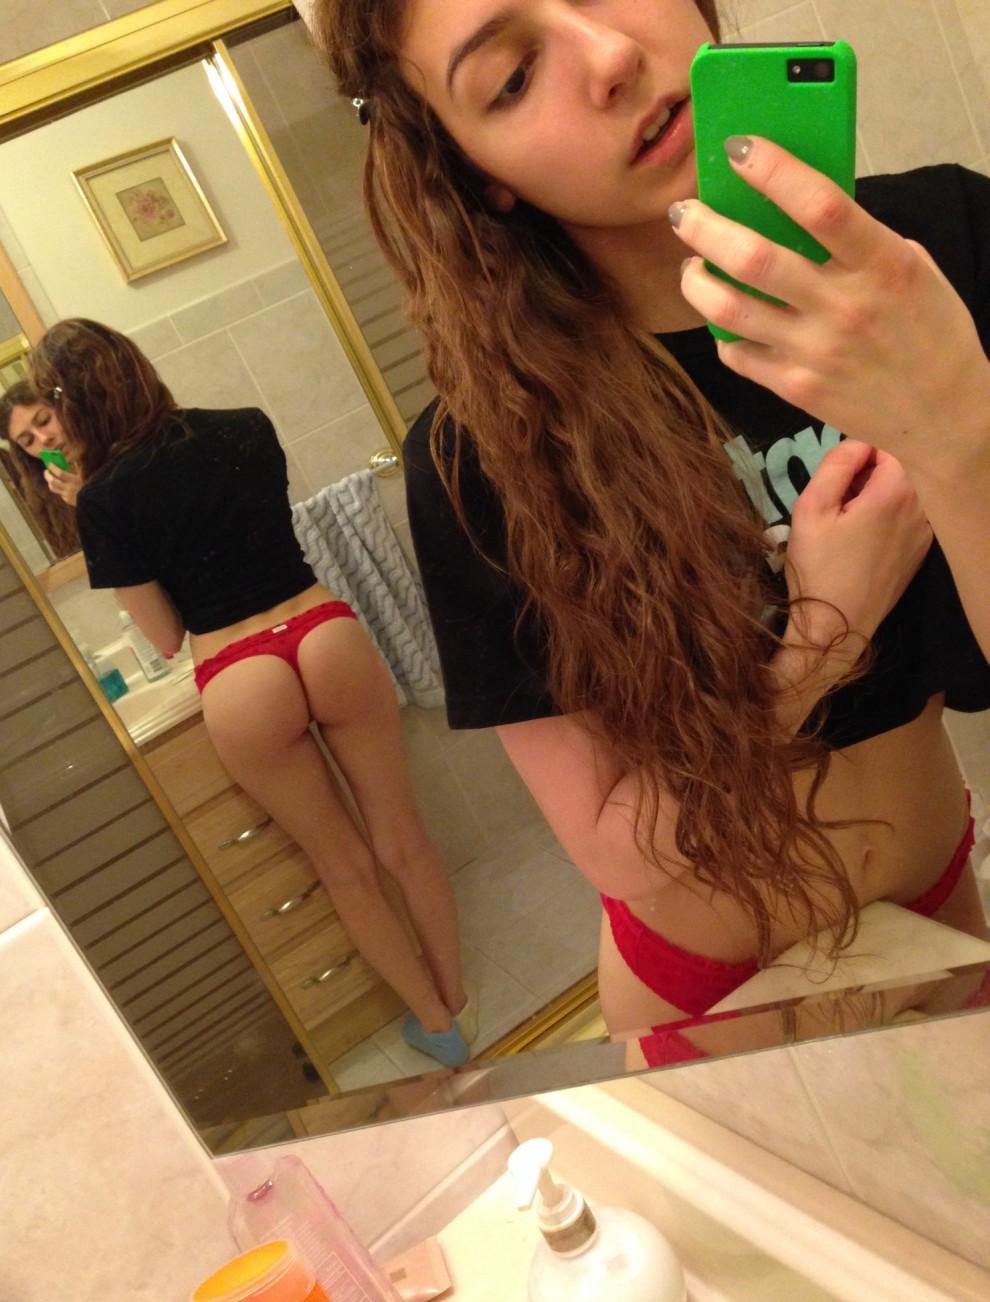 Dat mirror gap